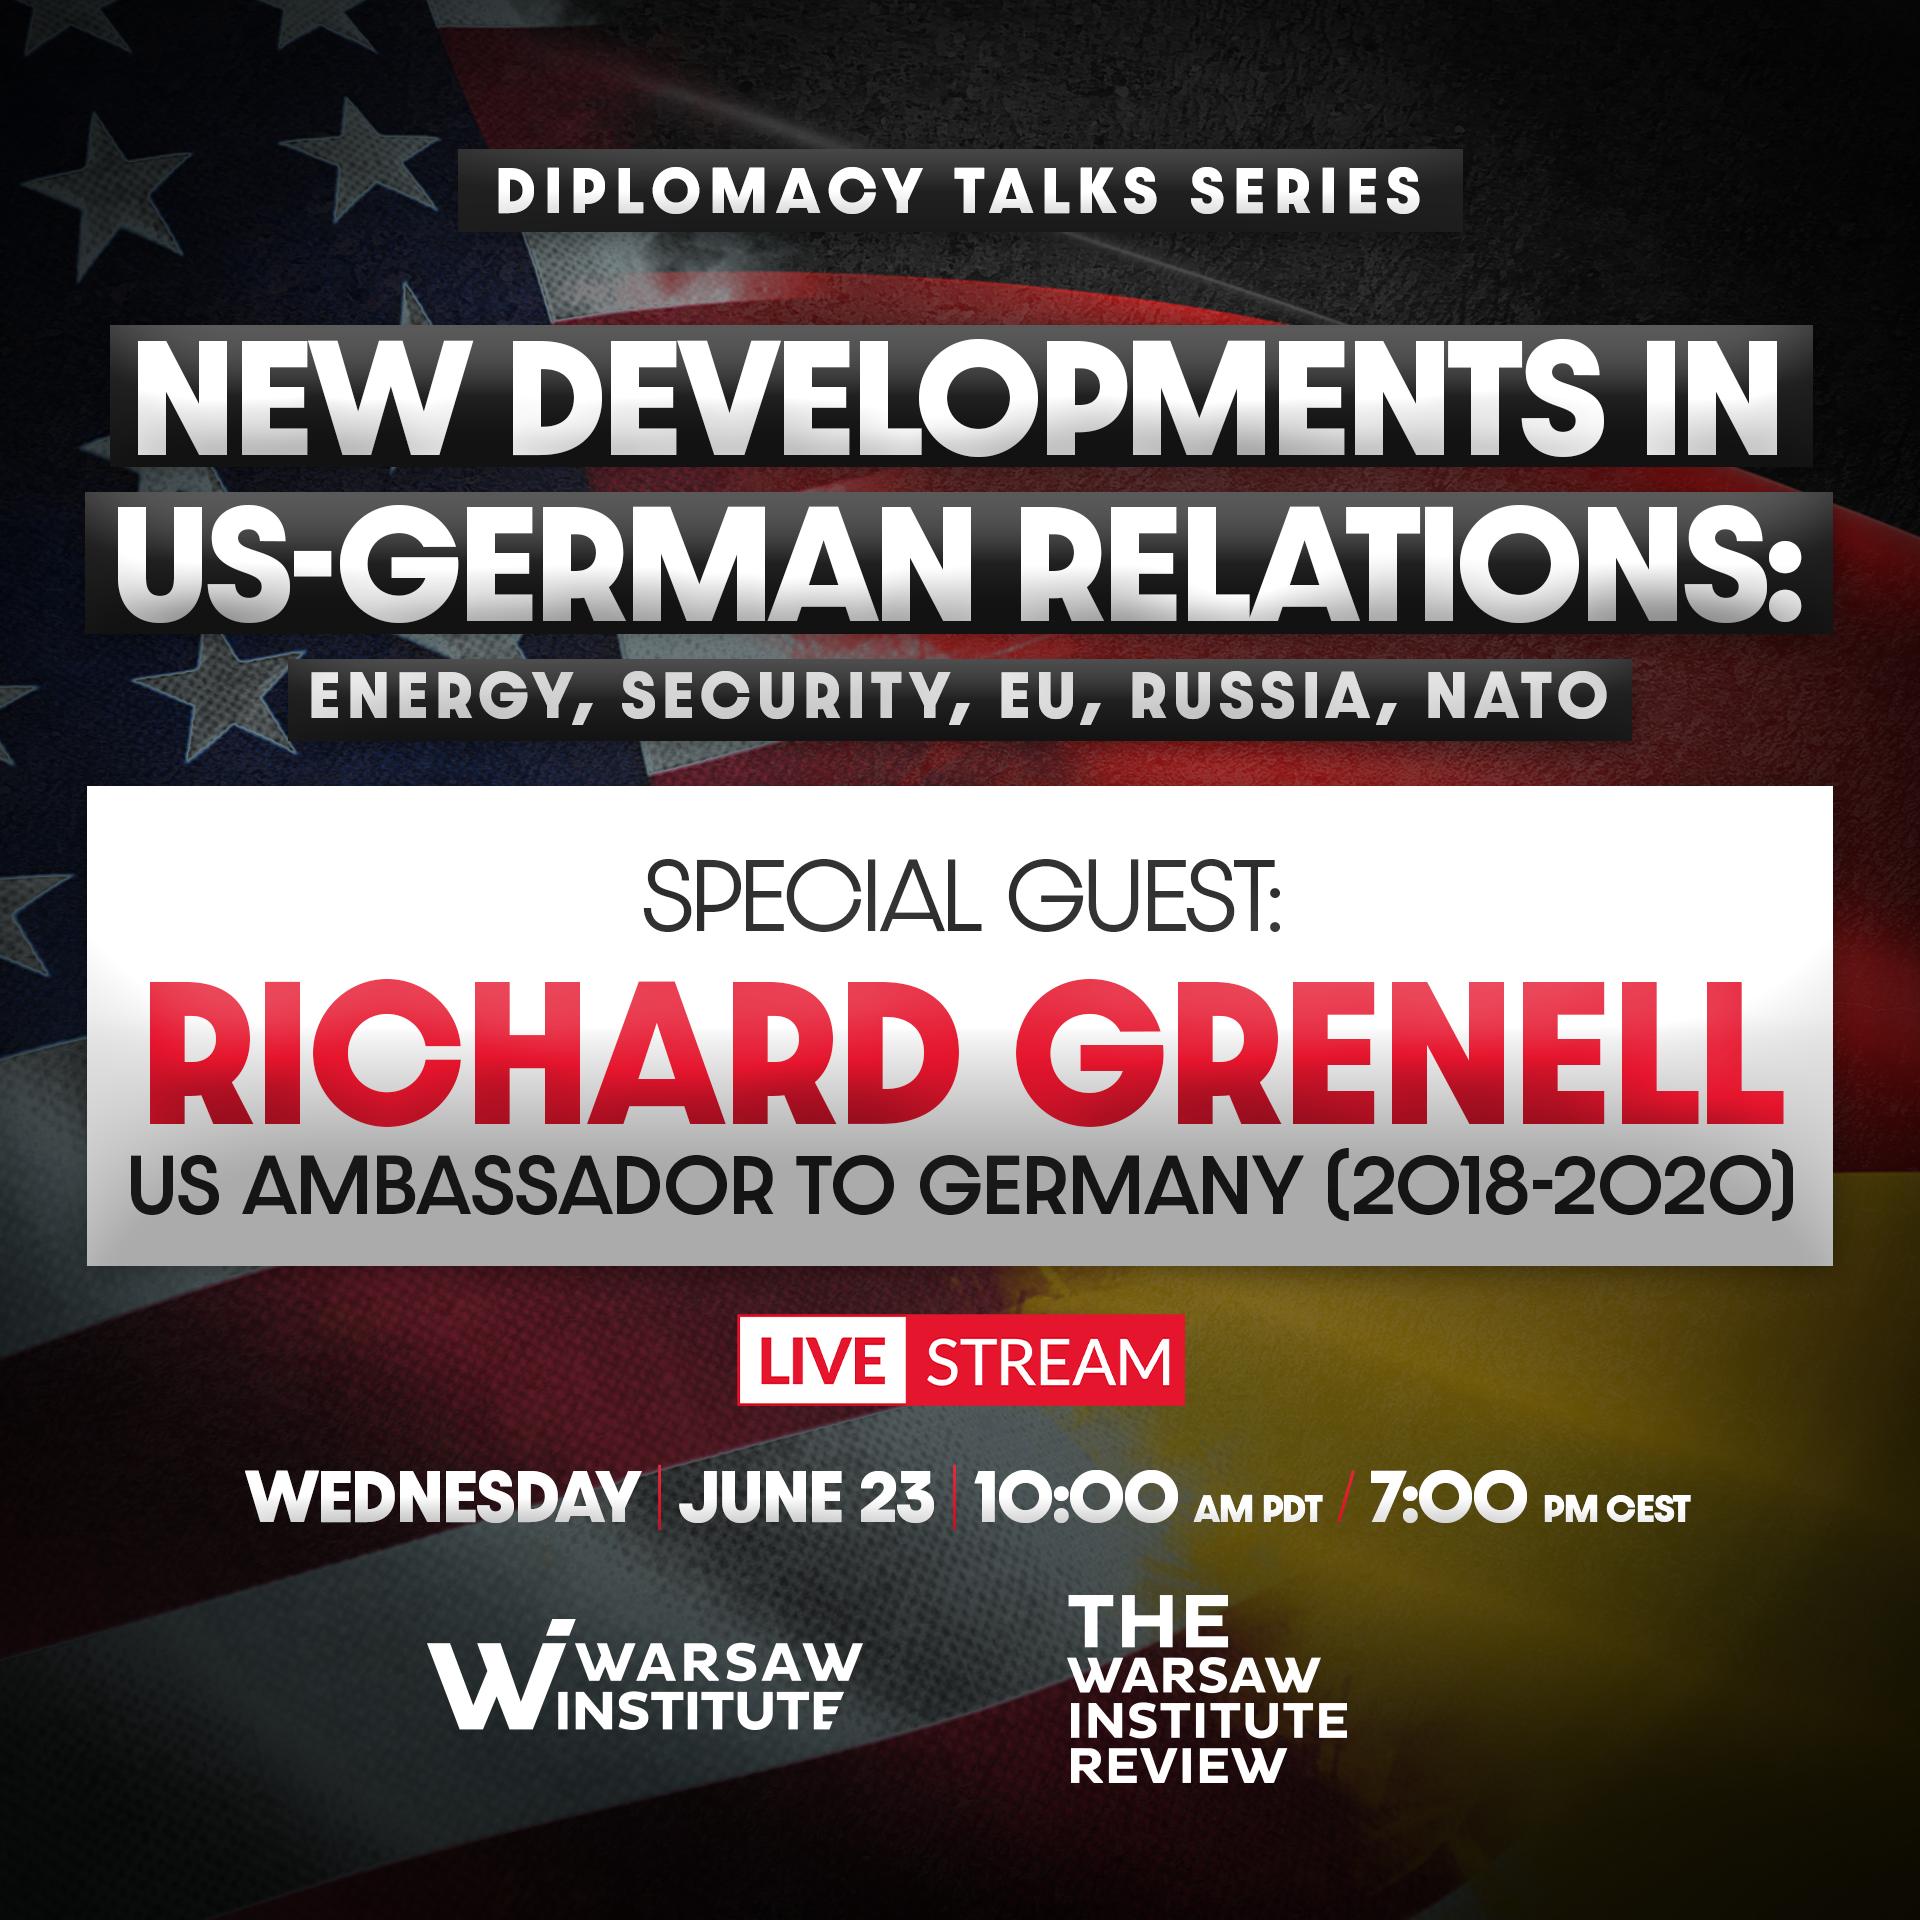 New developments in US-German relations: energy, security, EU, Russia, NATO